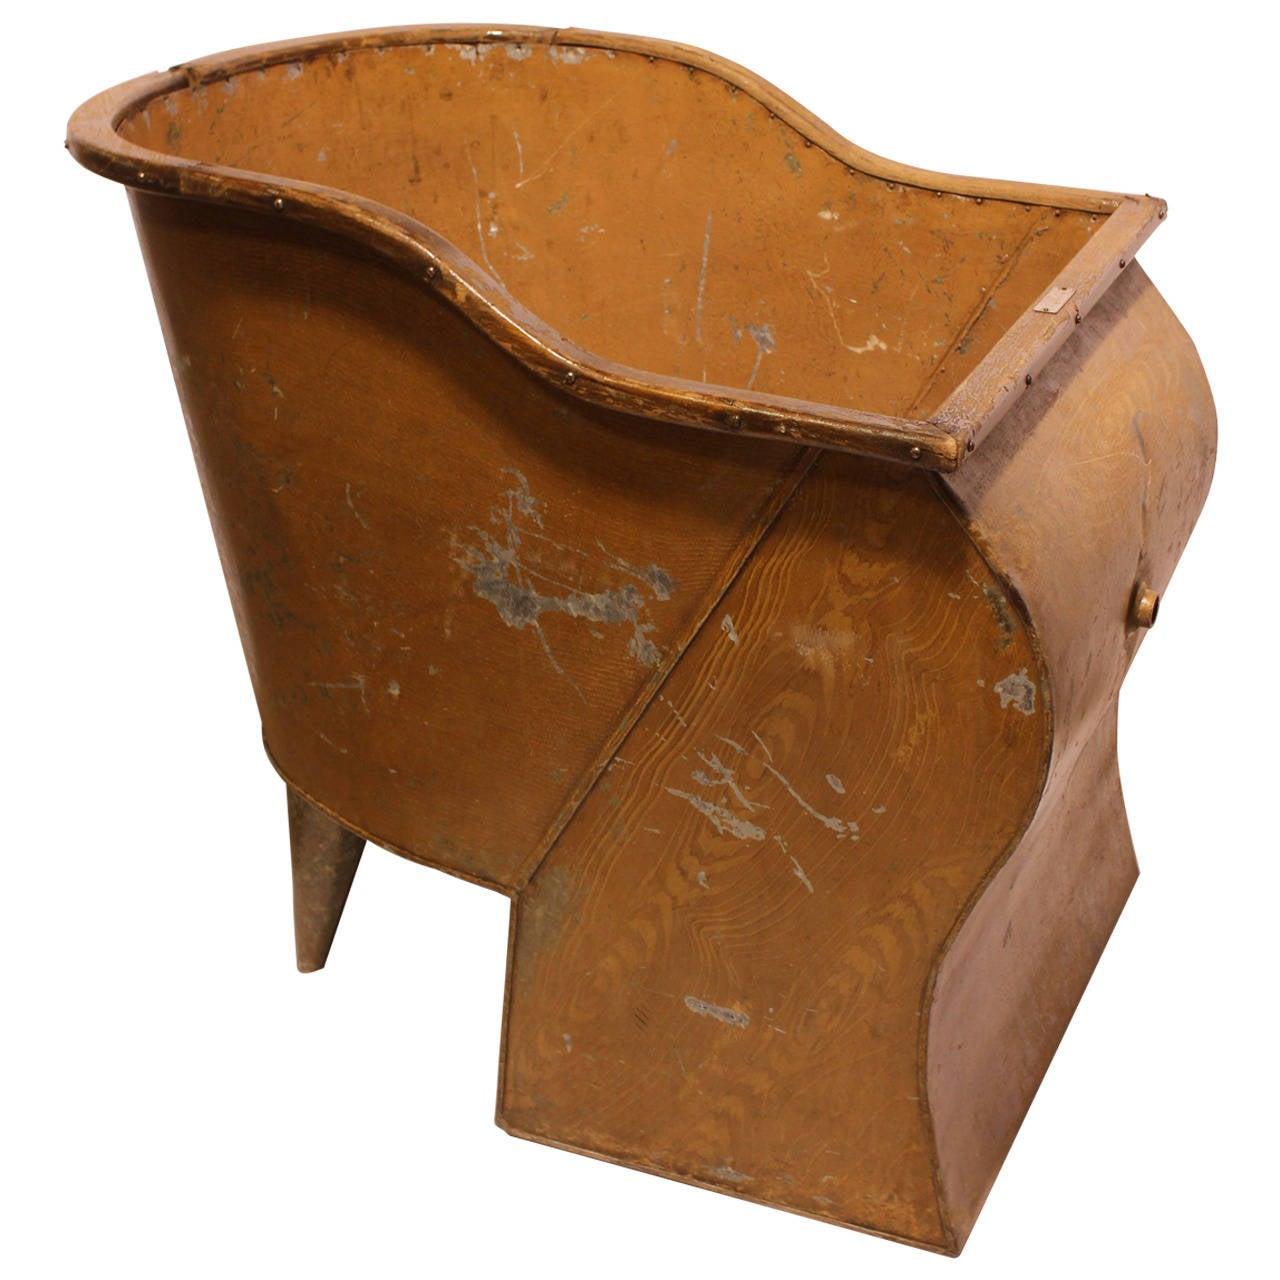 antique american tin sit bathtub at 1stdibs. Black Bedroom Furniture Sets. Home Design Ideas